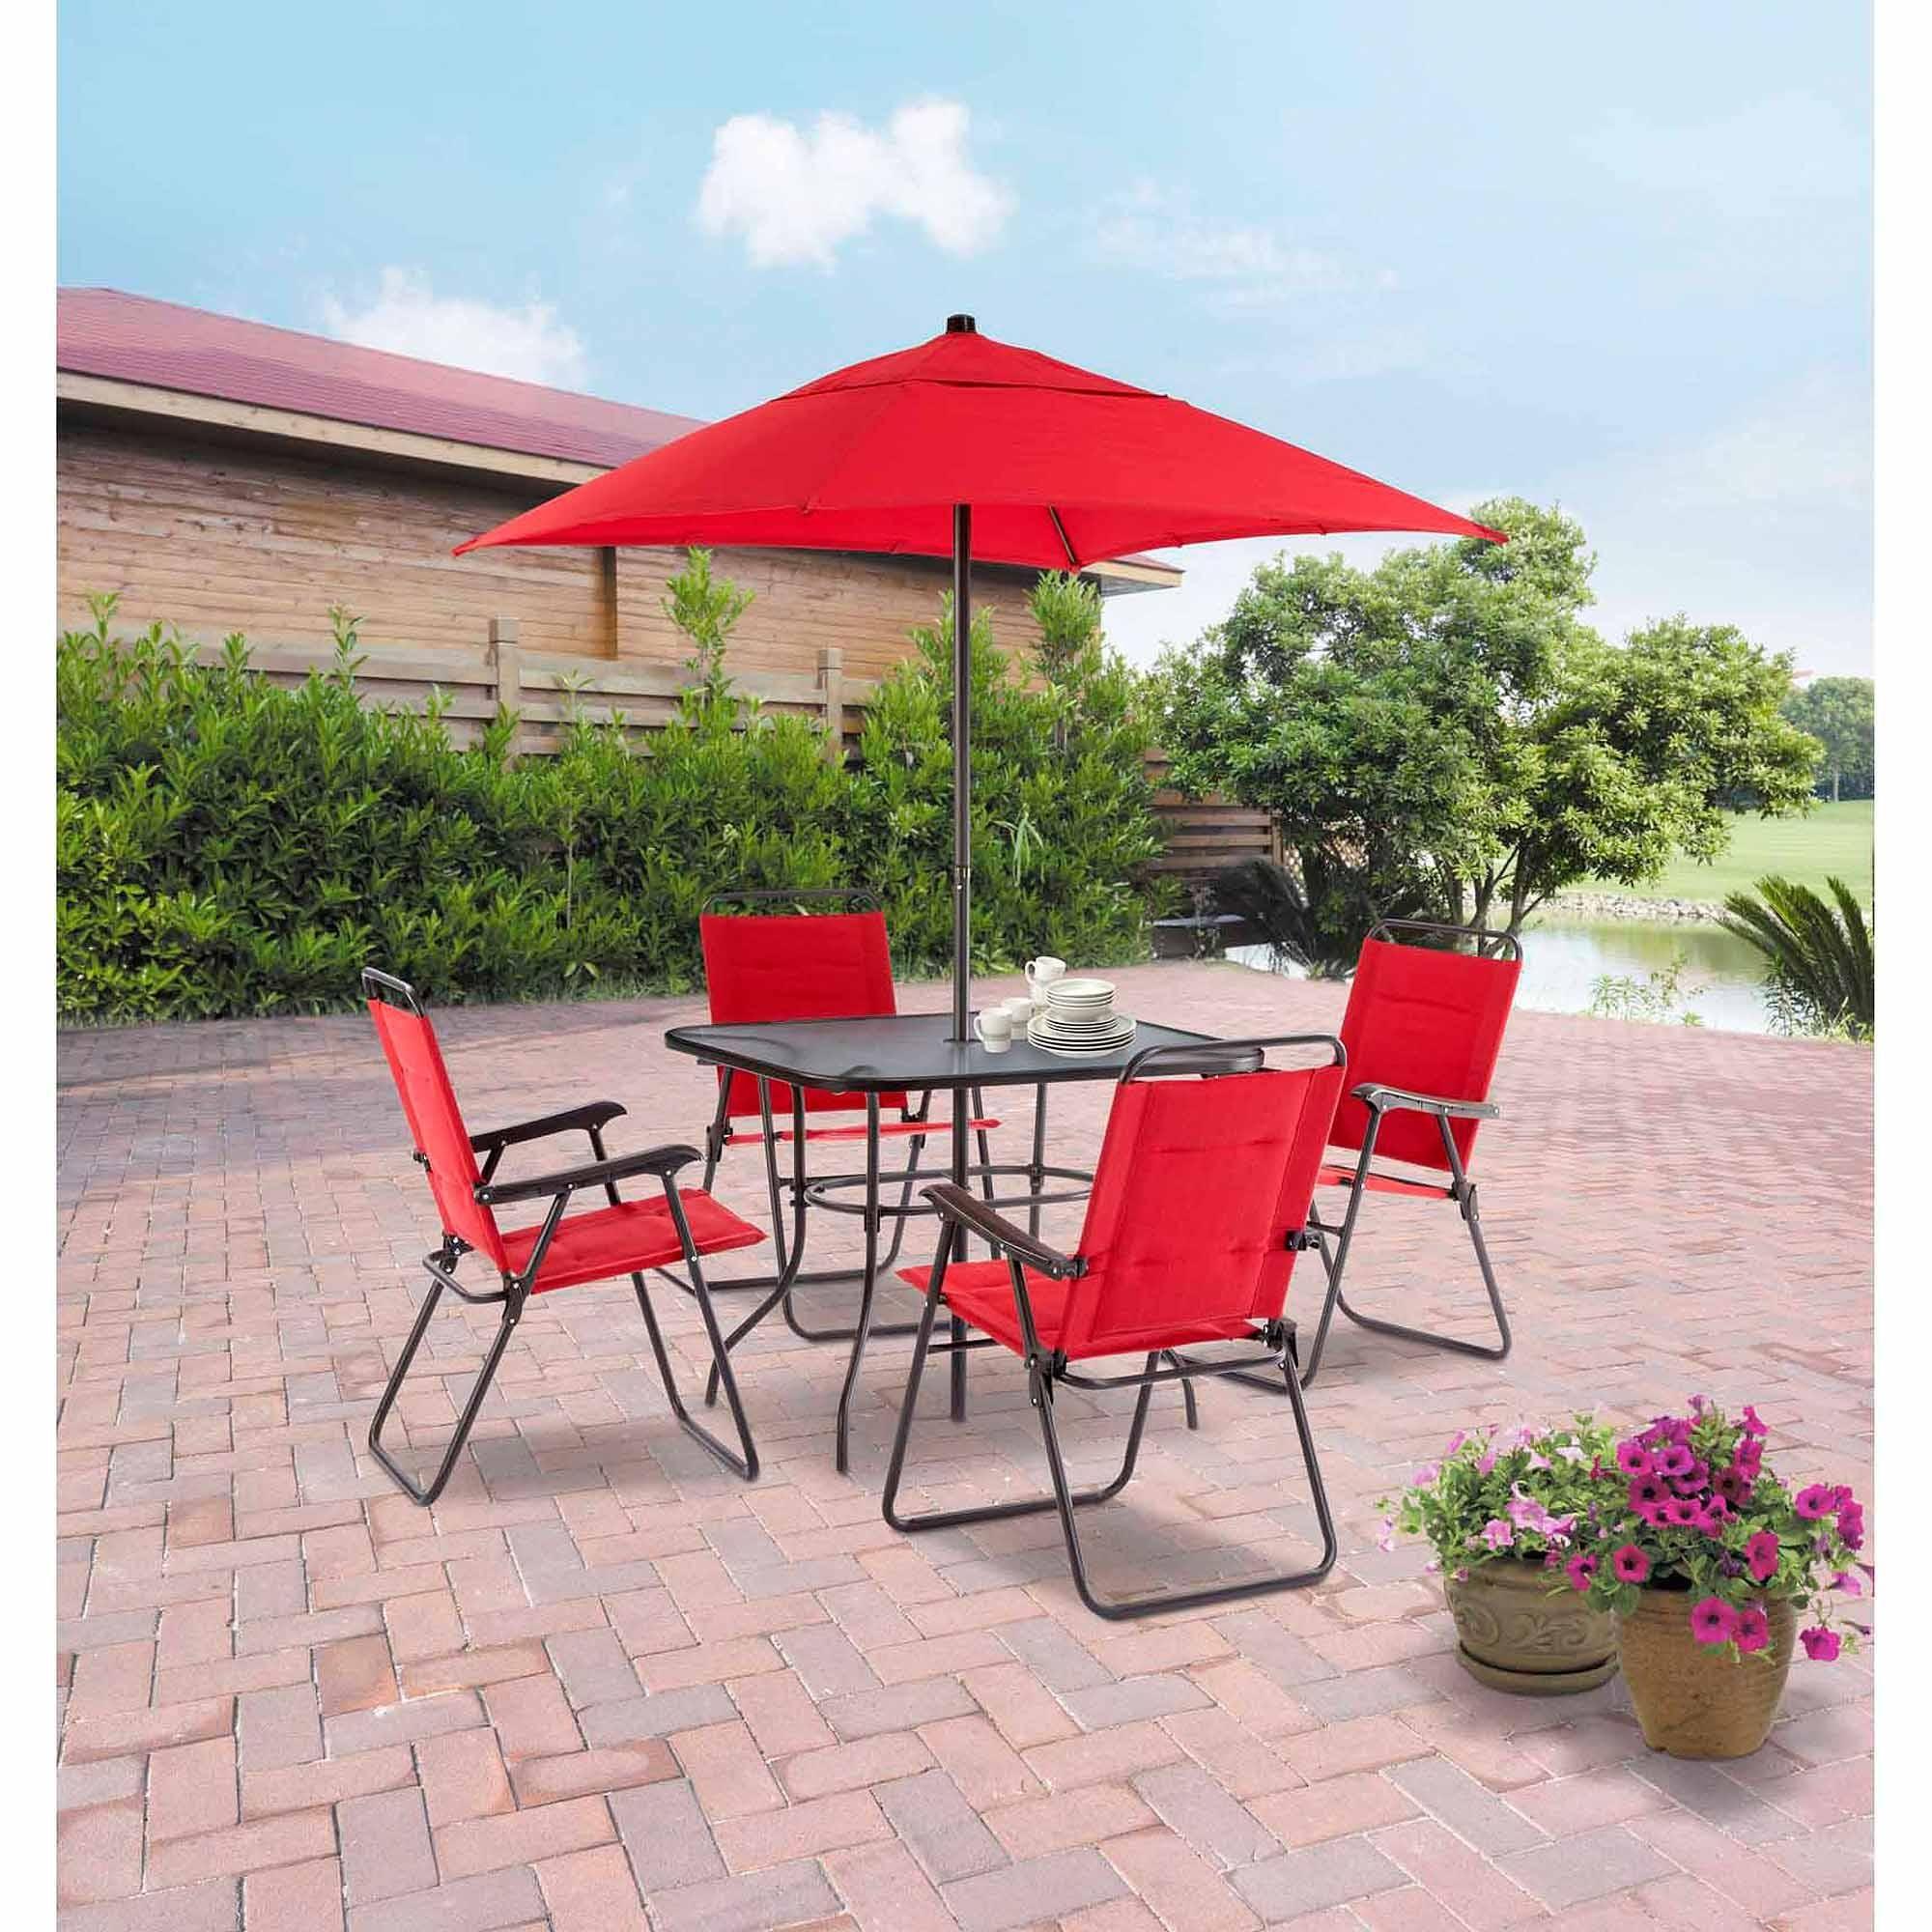 Outdoor Furniture Sale Walmart Best Spray Paint for Wood Furniture